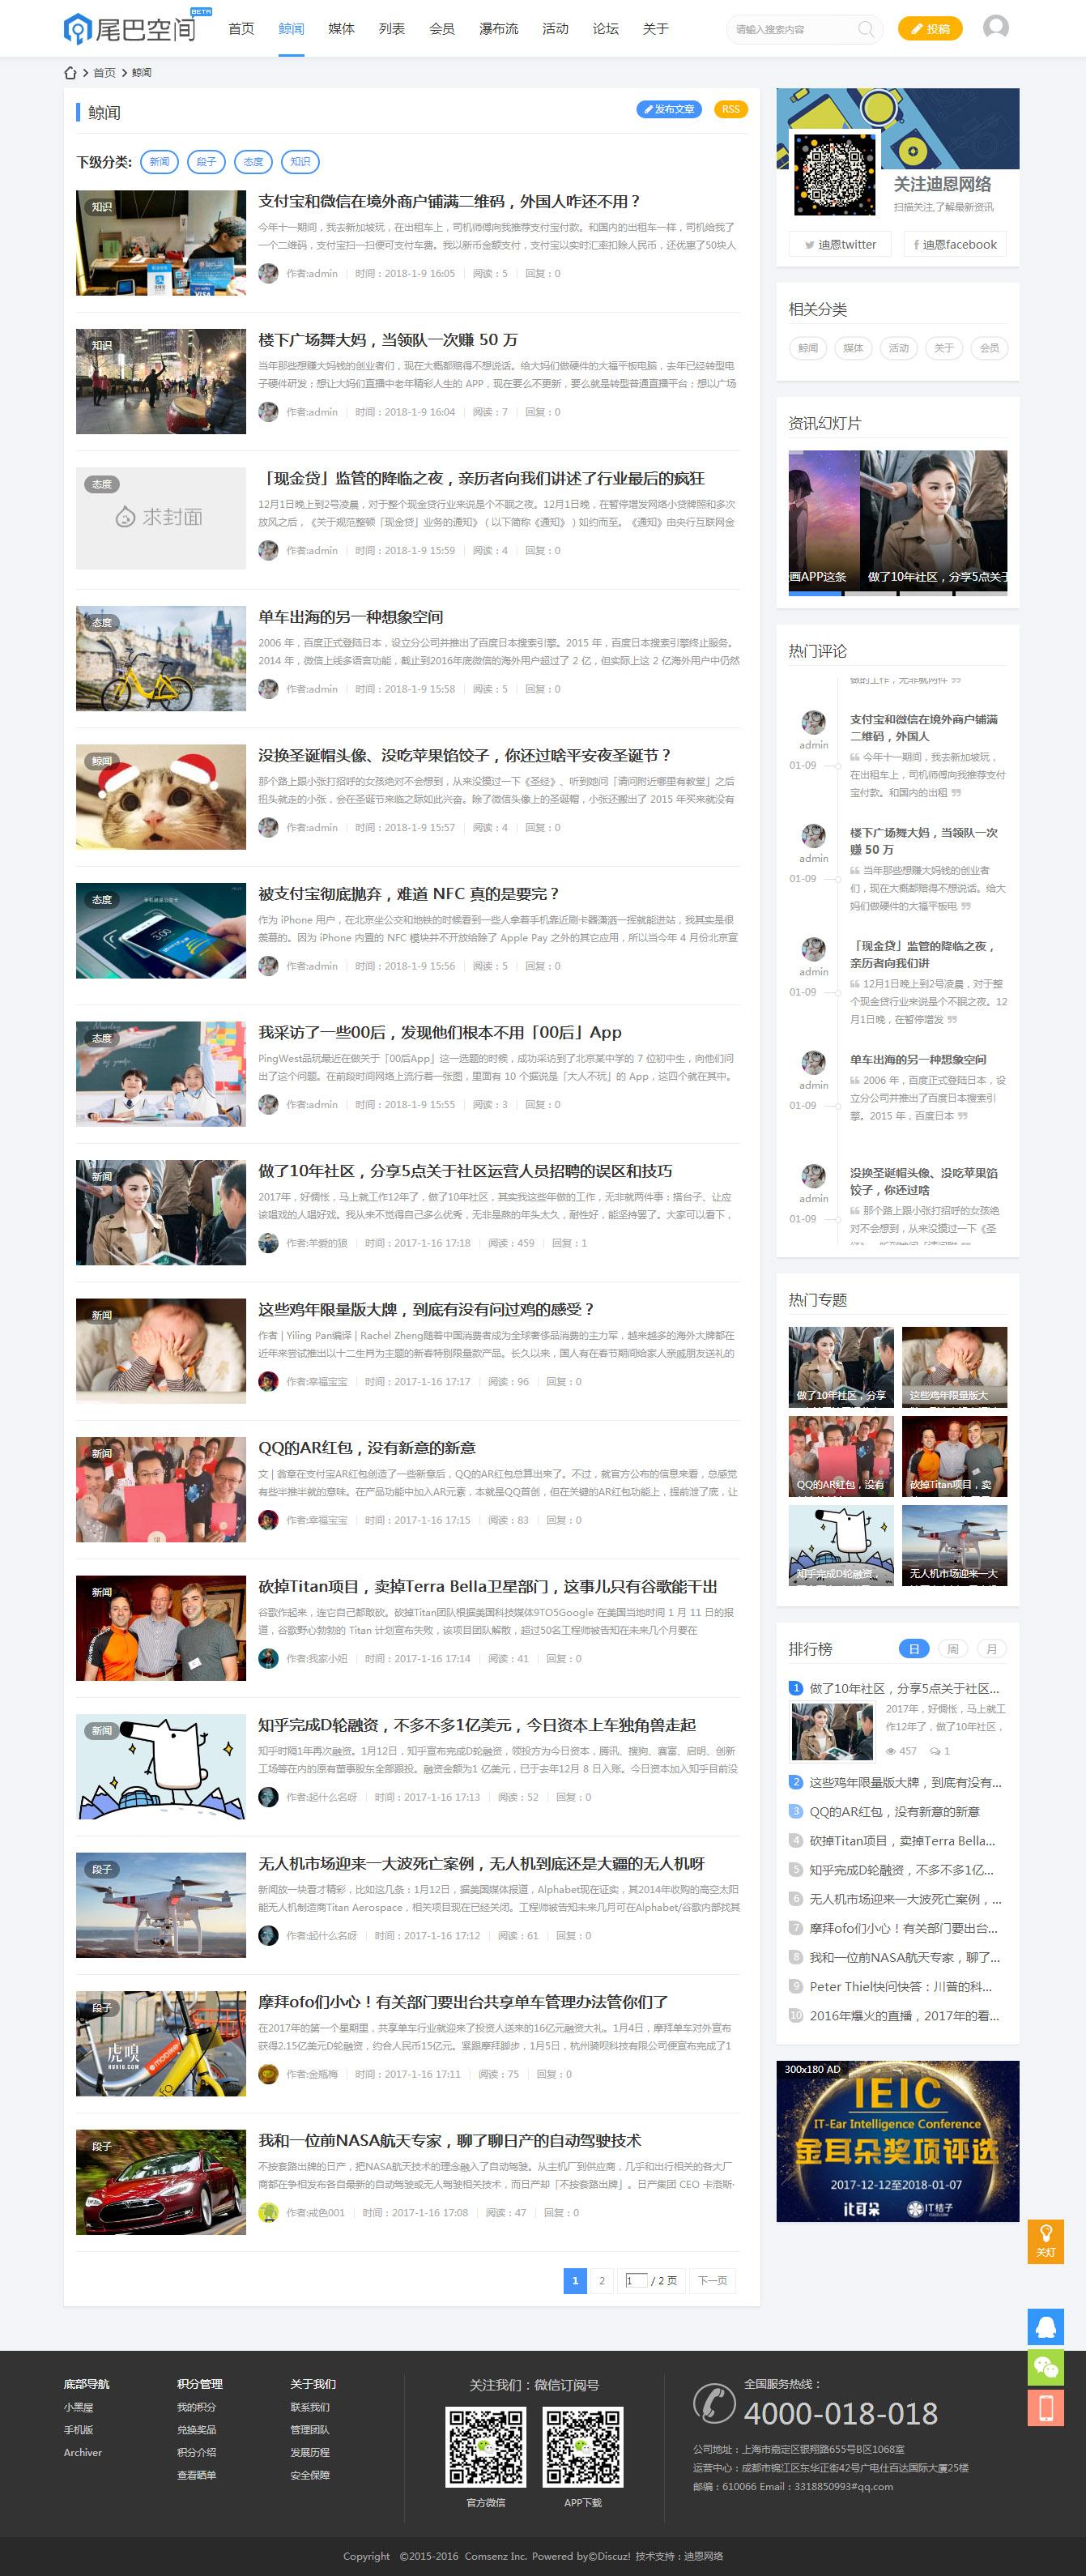 【discuz模板下载】 迪恩wlnet资讯媒体干货 vip商业版新闻博客网站模板(百度网盘资源)